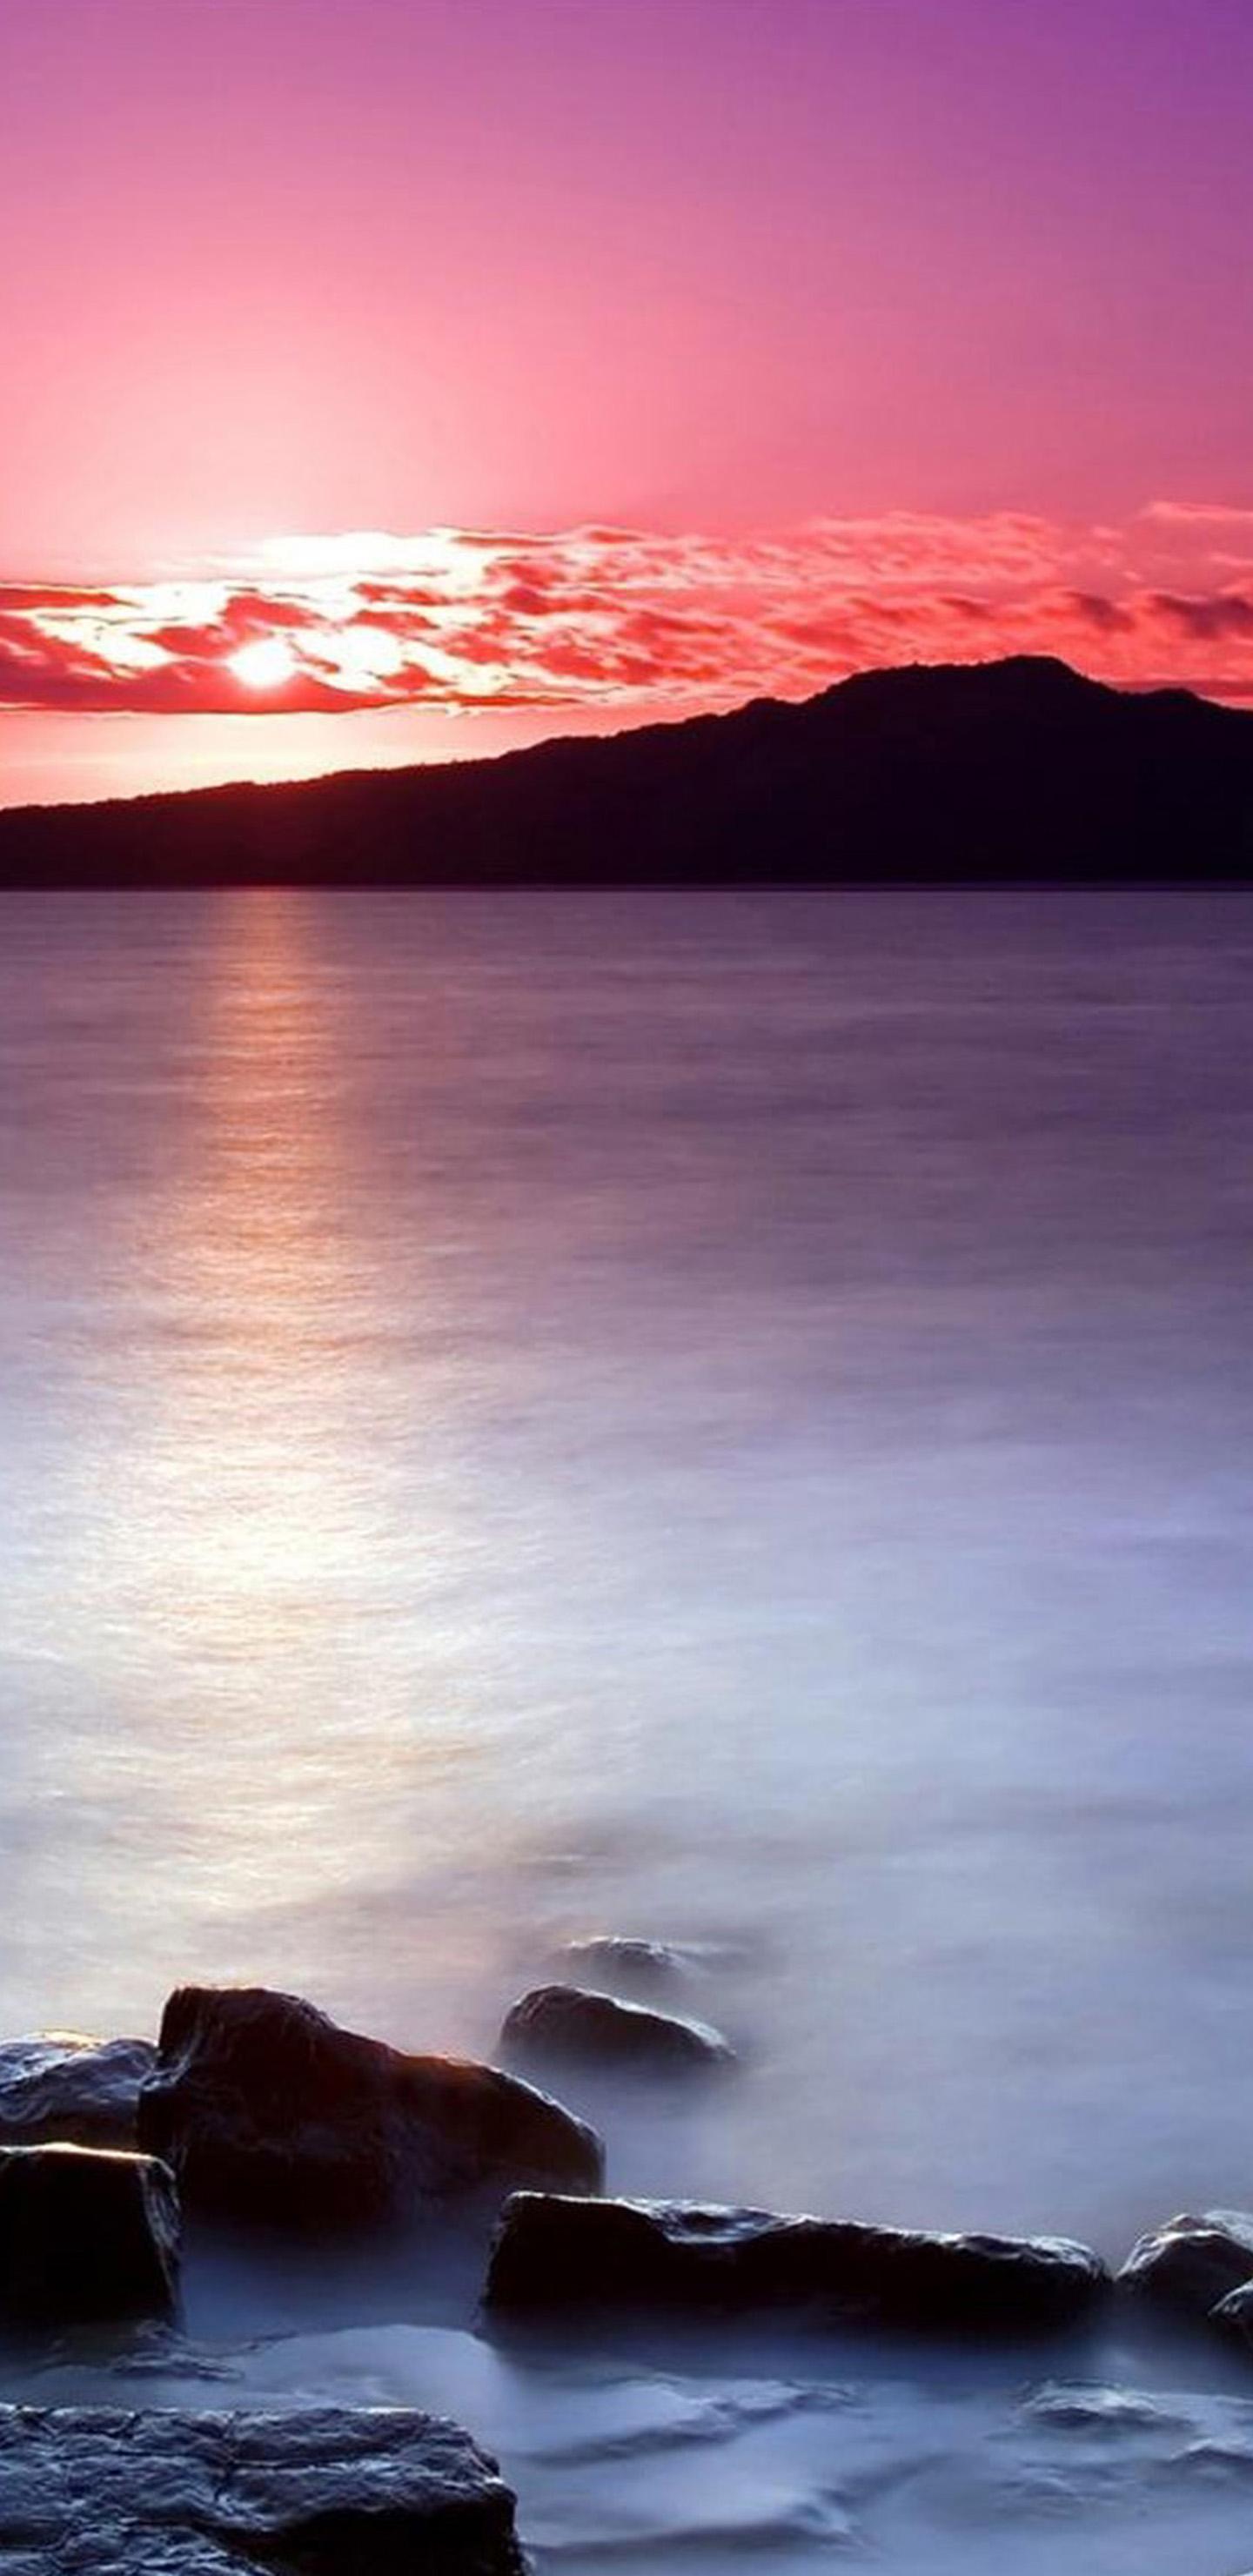 Sunset Sea Galaxy S8 Wallpapers Samsung Galaxy Wallpaper Sunset 315781 Hd Wallpaper Backgrounds Download